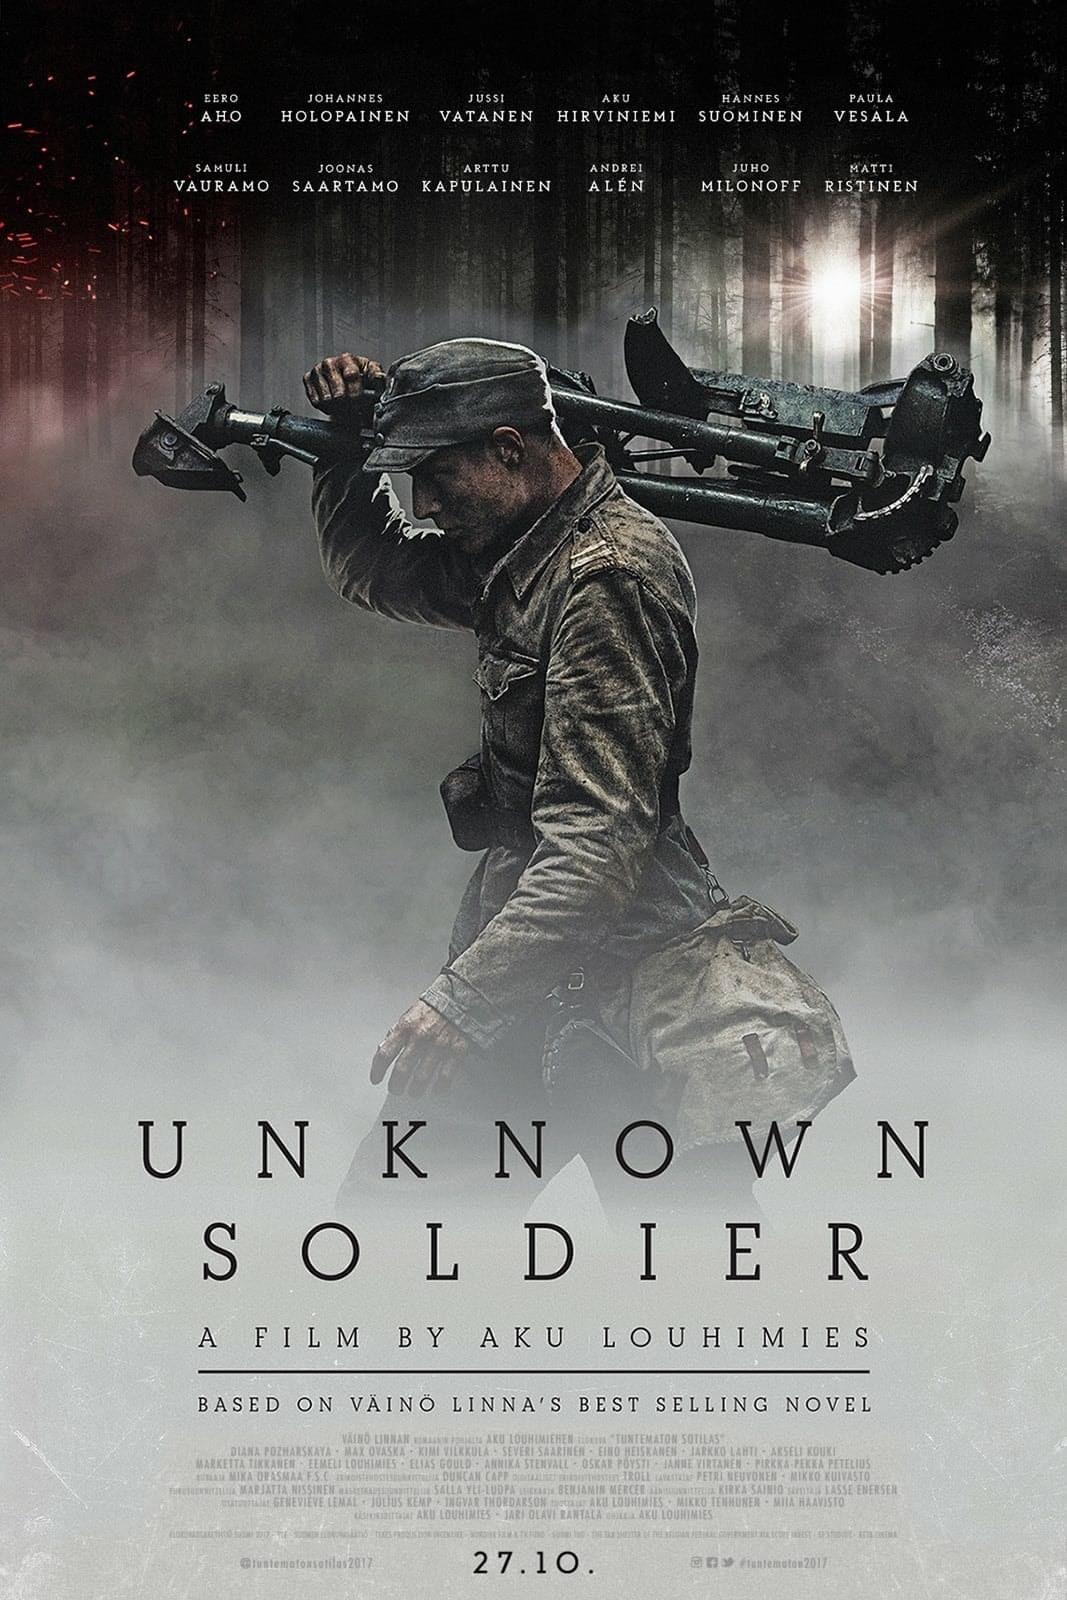 Unknown Soldier in 2020 Unknown soldier, Soldier, War film